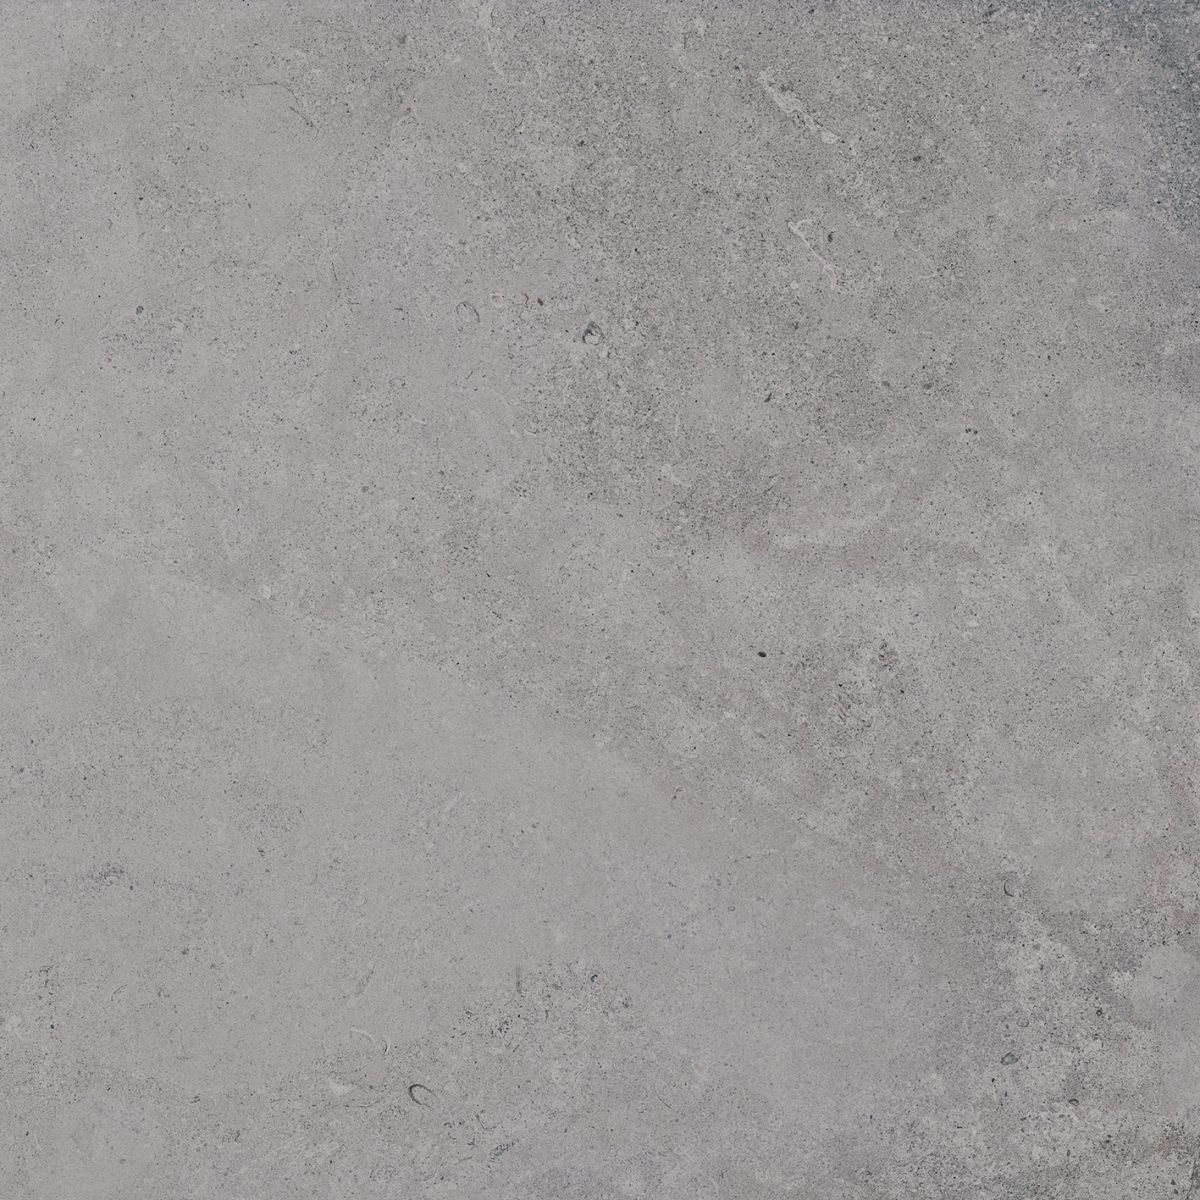 Porcelanosa Mosa-River Acero Anti-Slip Tile 120 x 120 cm